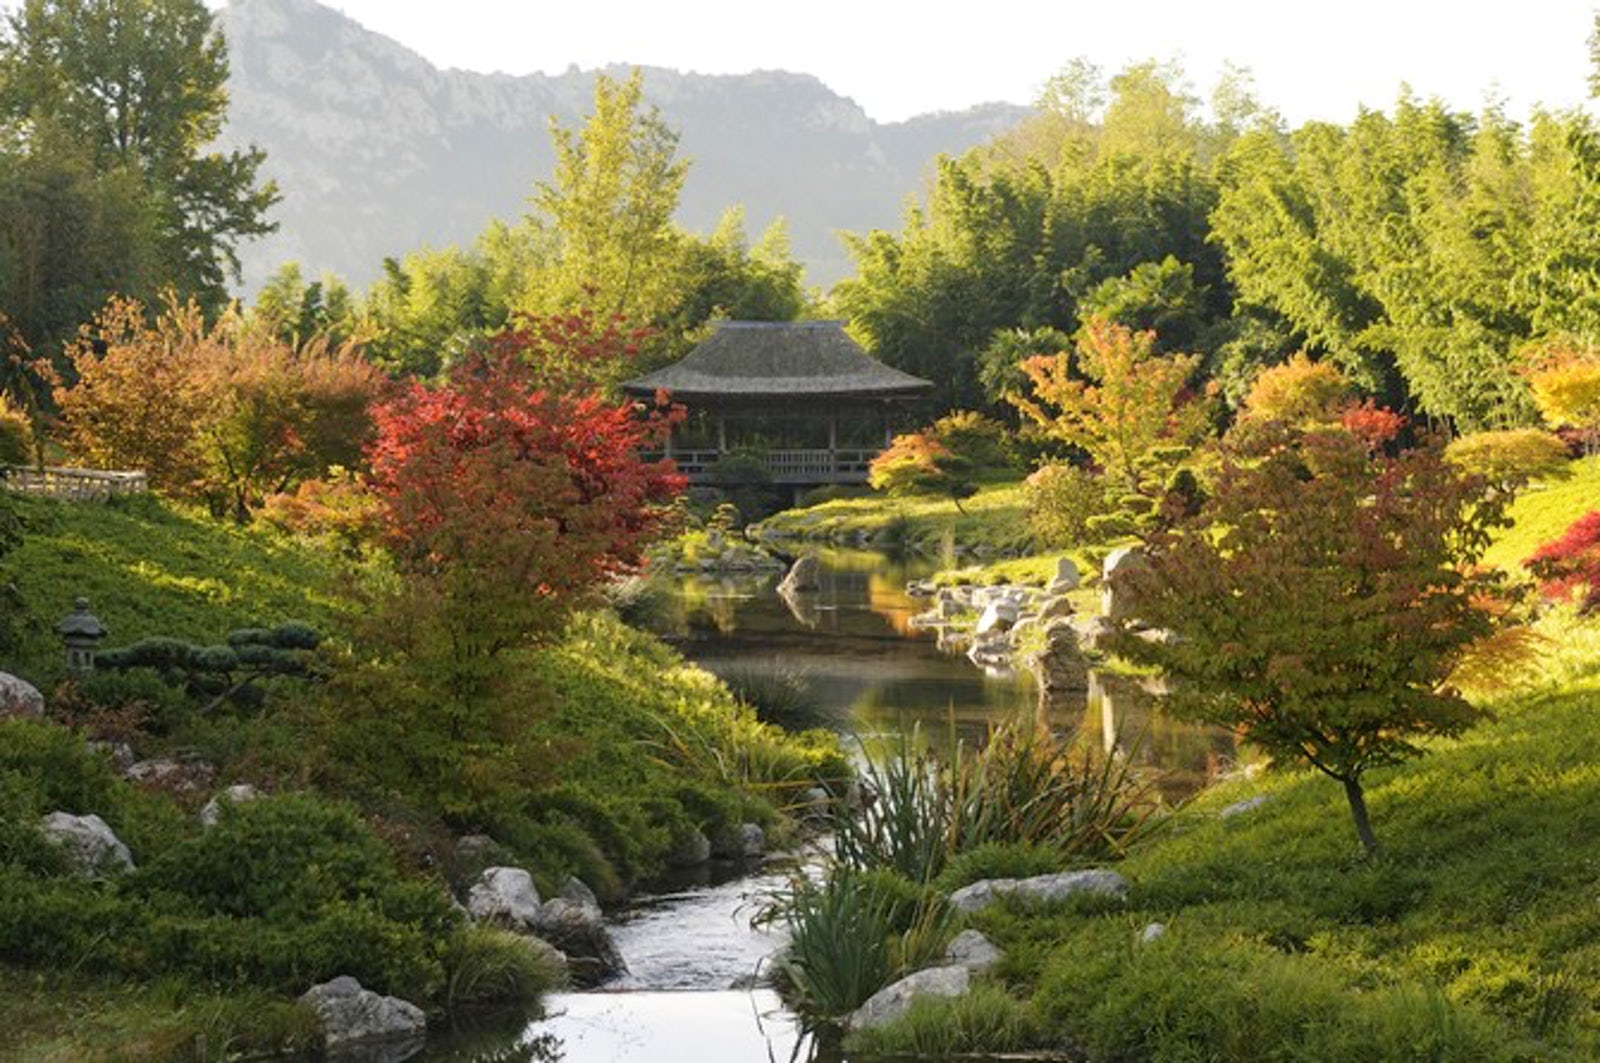 Travel inspired location jardin exotique prafrance bambouseraie d 39 anduze itinari - La bambouseraie a anduze ...